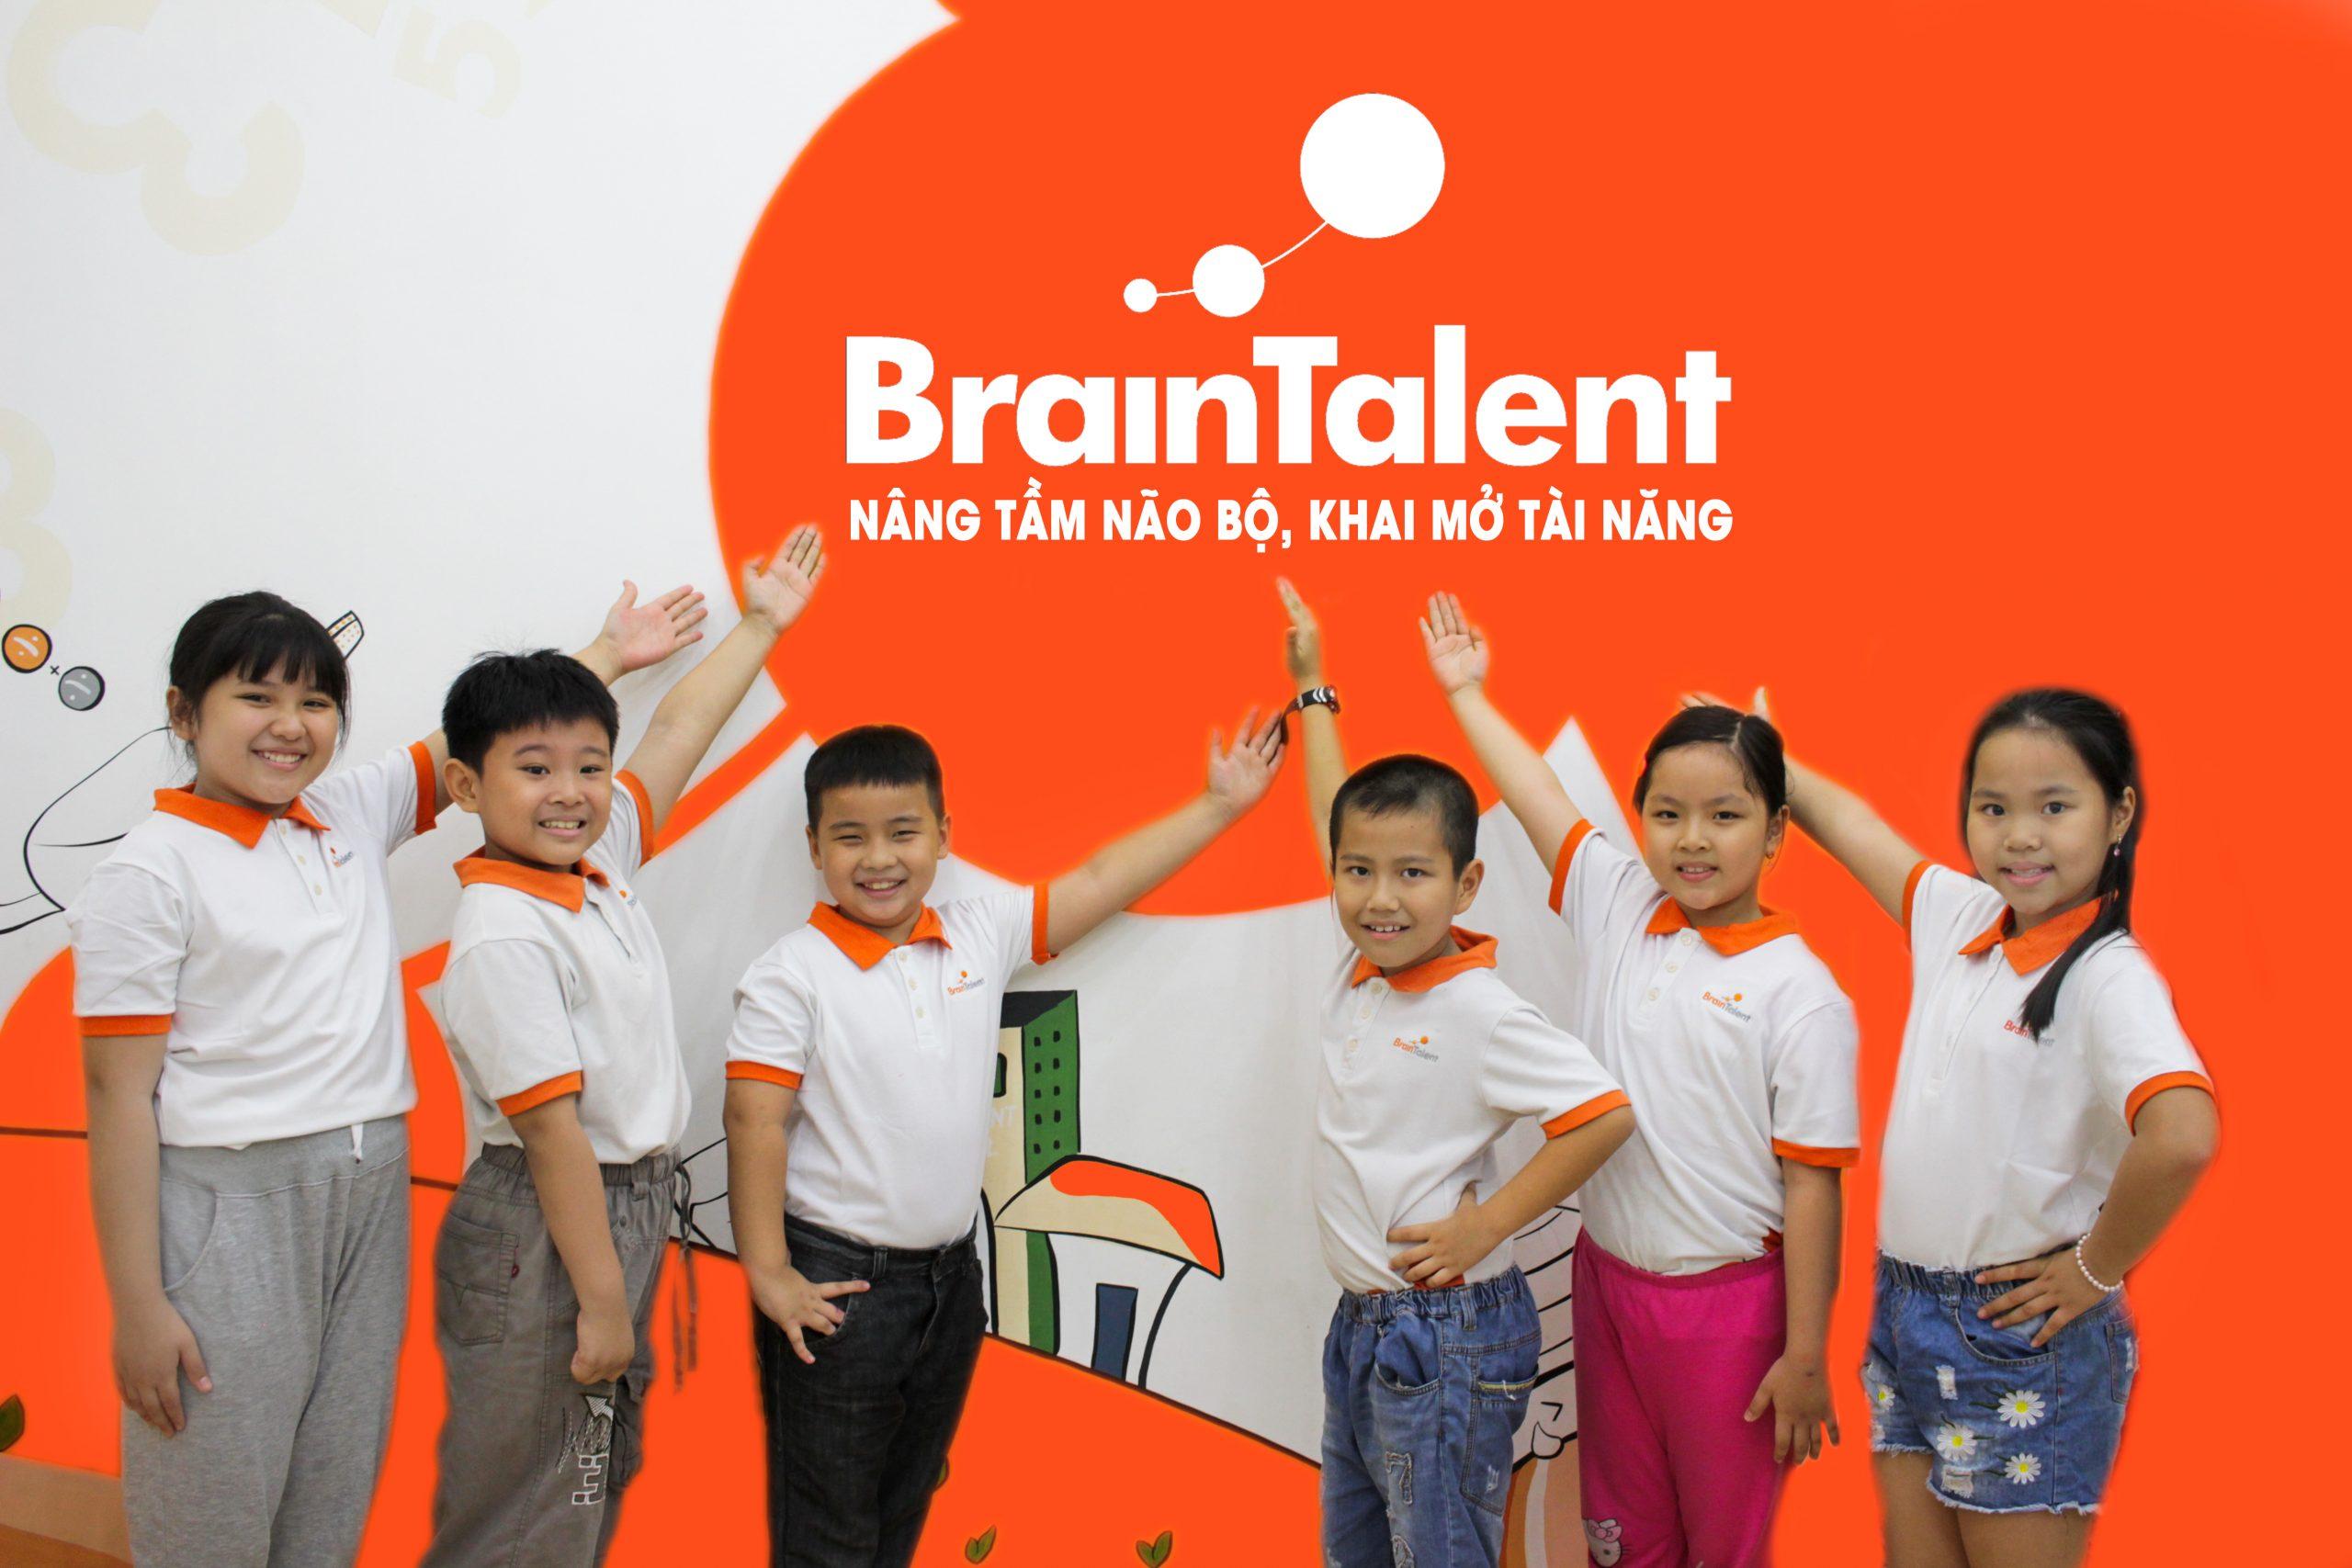 Braintalent